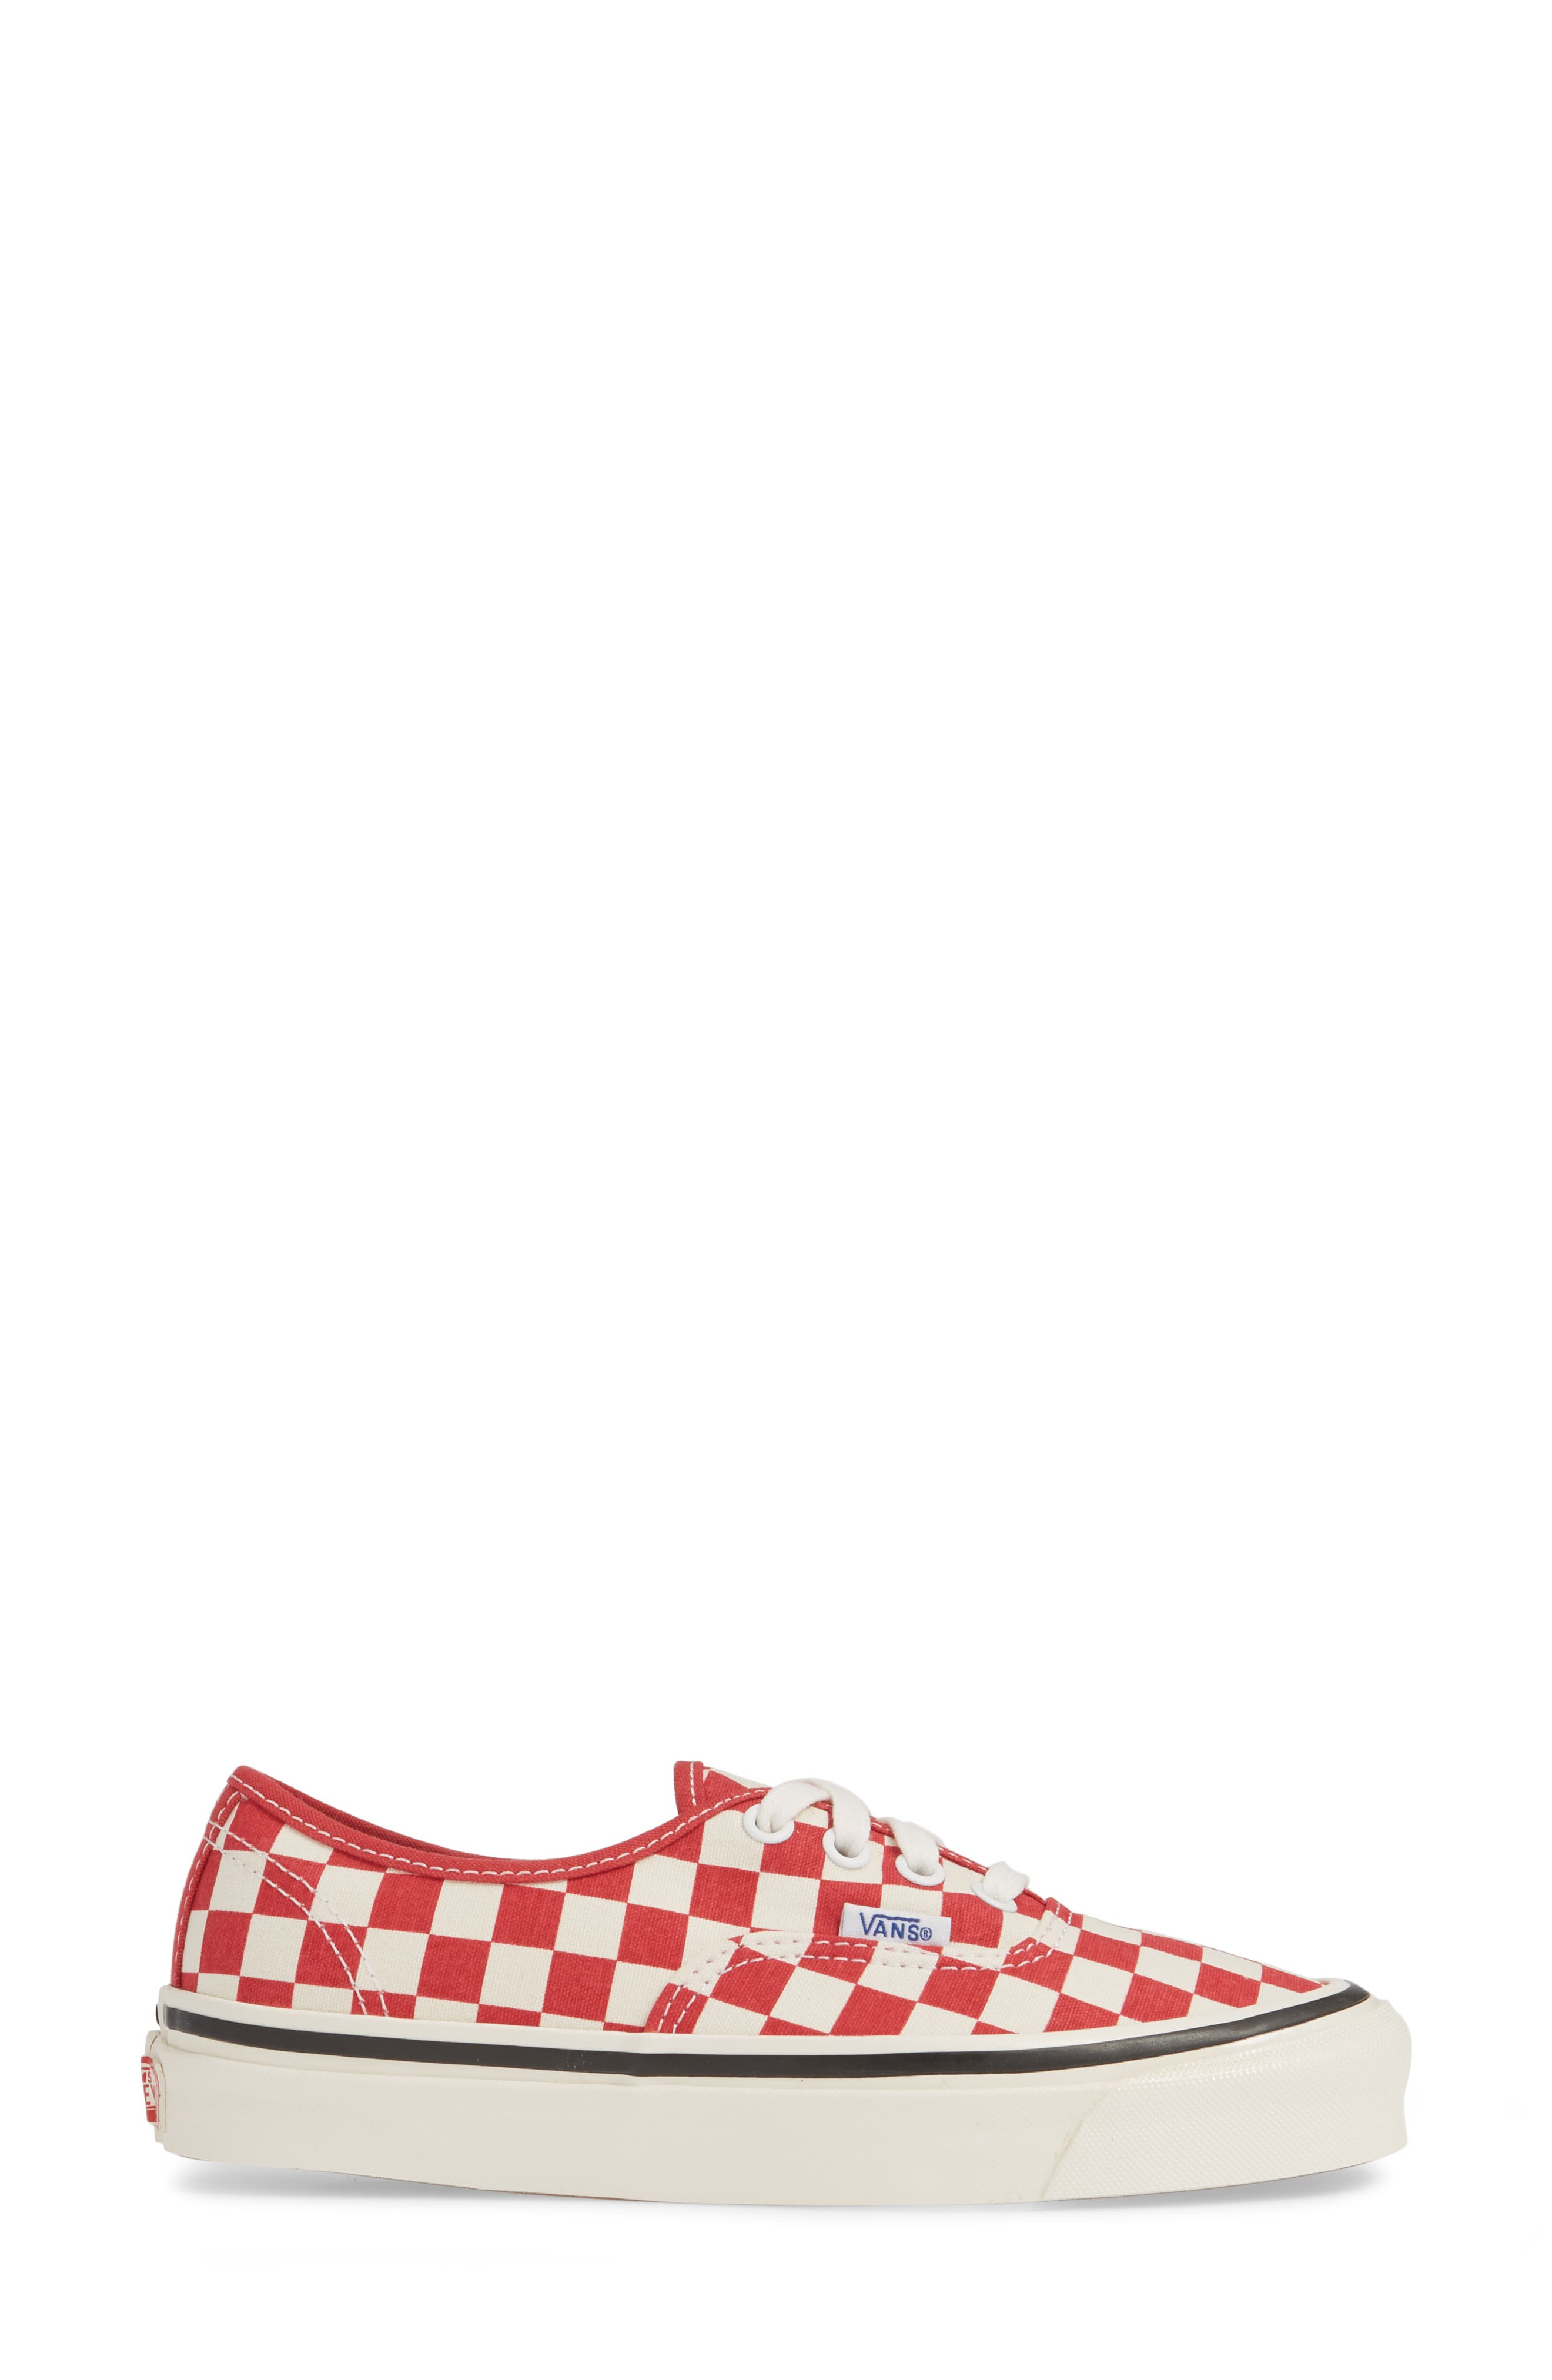 VANS, Authentic 44 DX Sneaker, Alternate thumbnail 3, color, RED/ CHECK